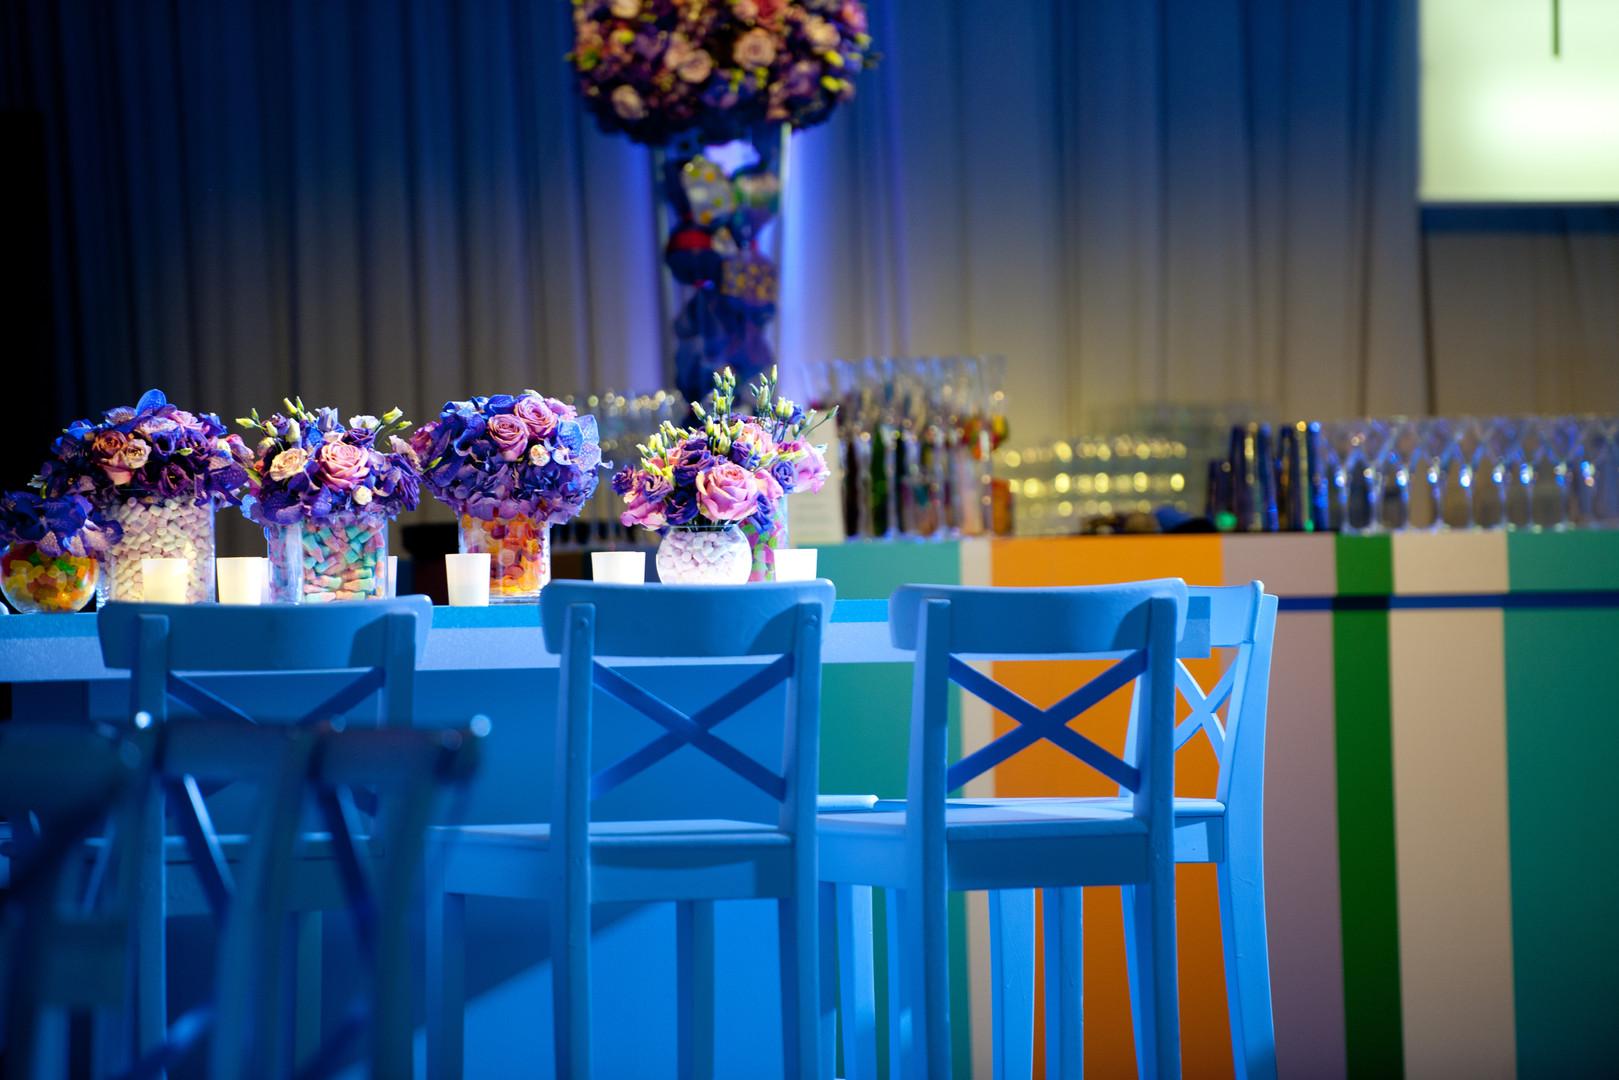 Sweet themed decor